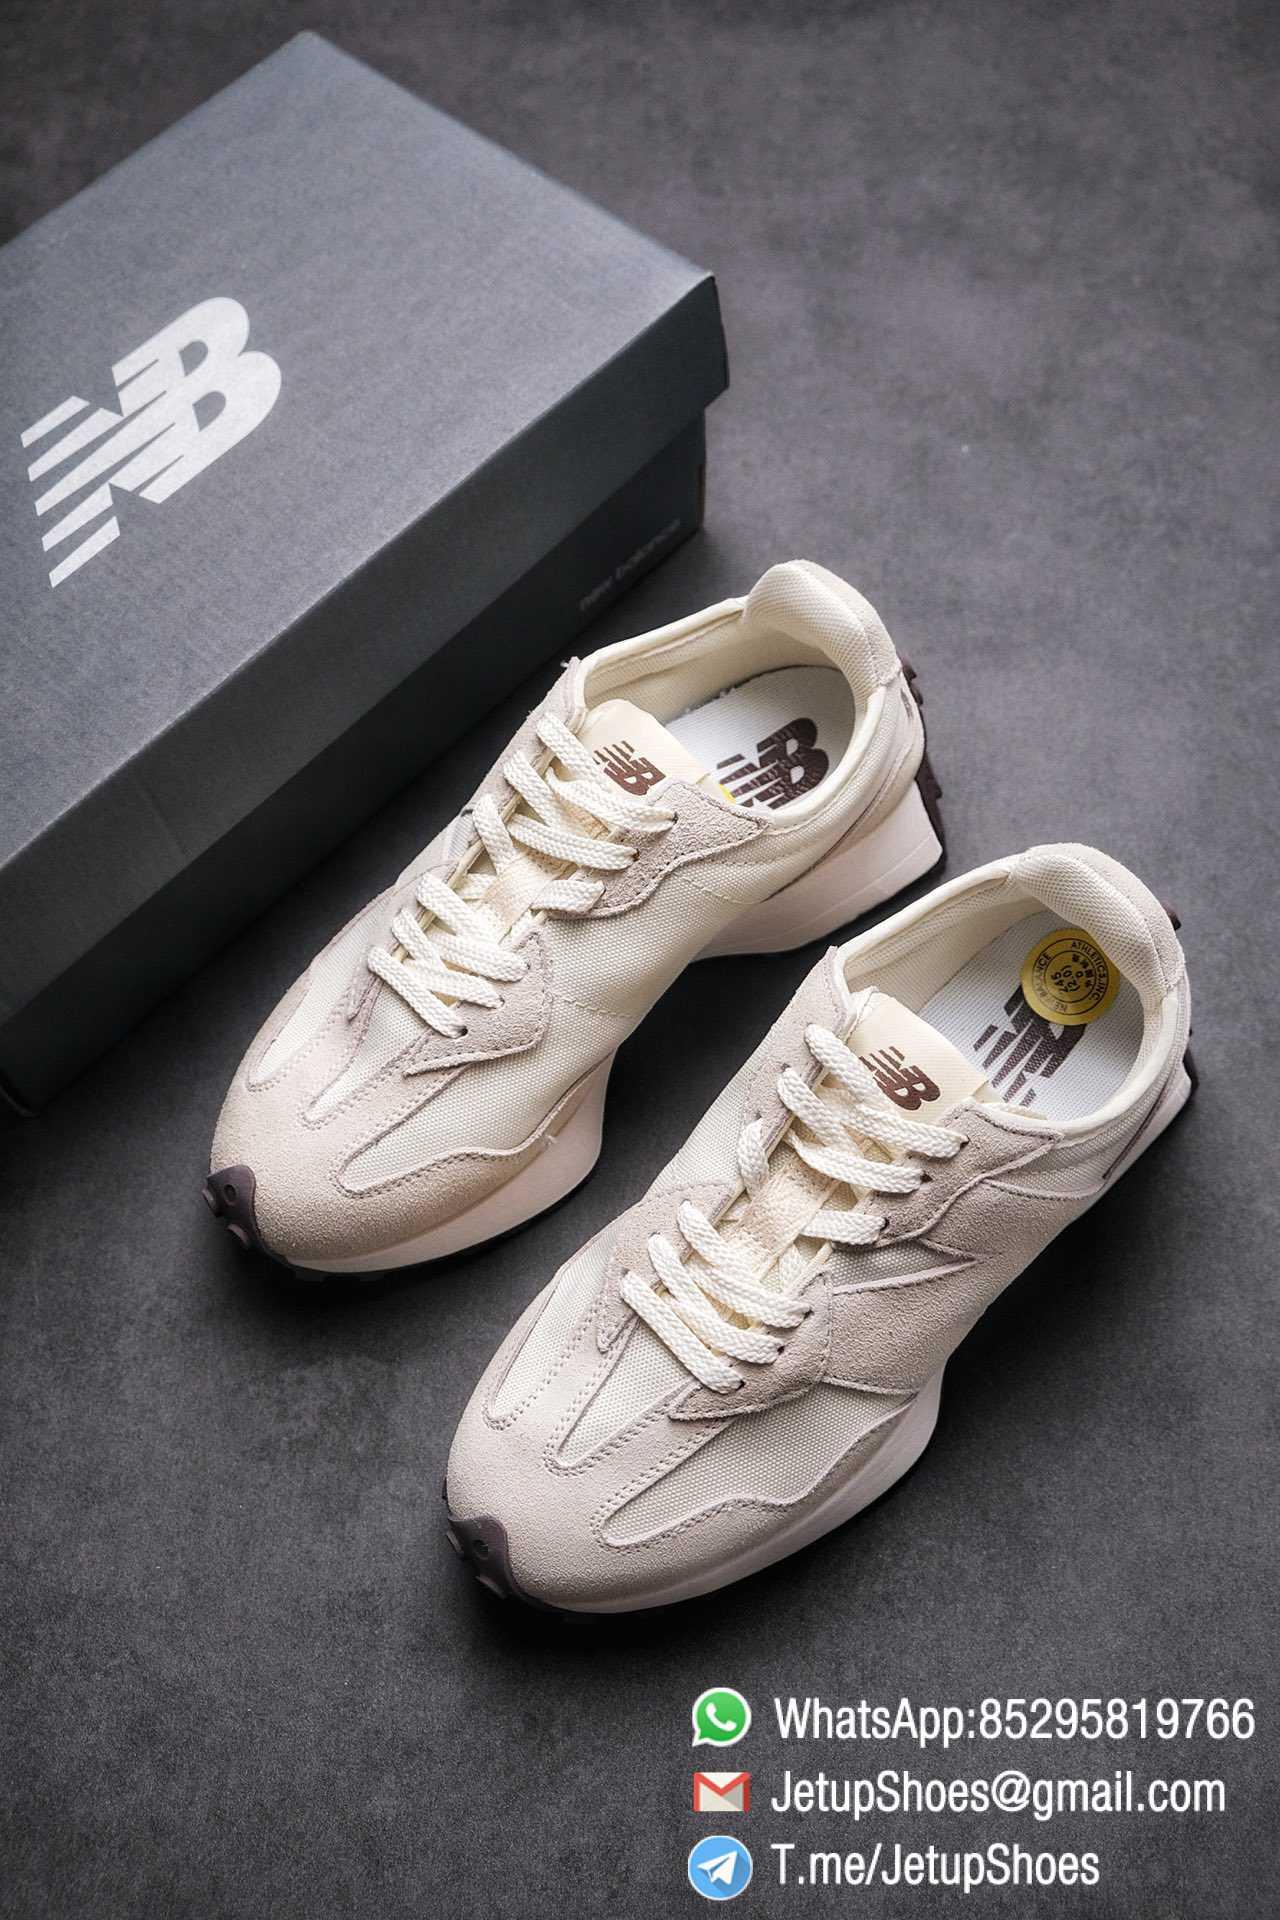 Replica Sneakers New Balance 327 Noritake x 327 Light Grey White Mesh Quarter Suede Upper Retro Running Shoes SKU WS327FB 04